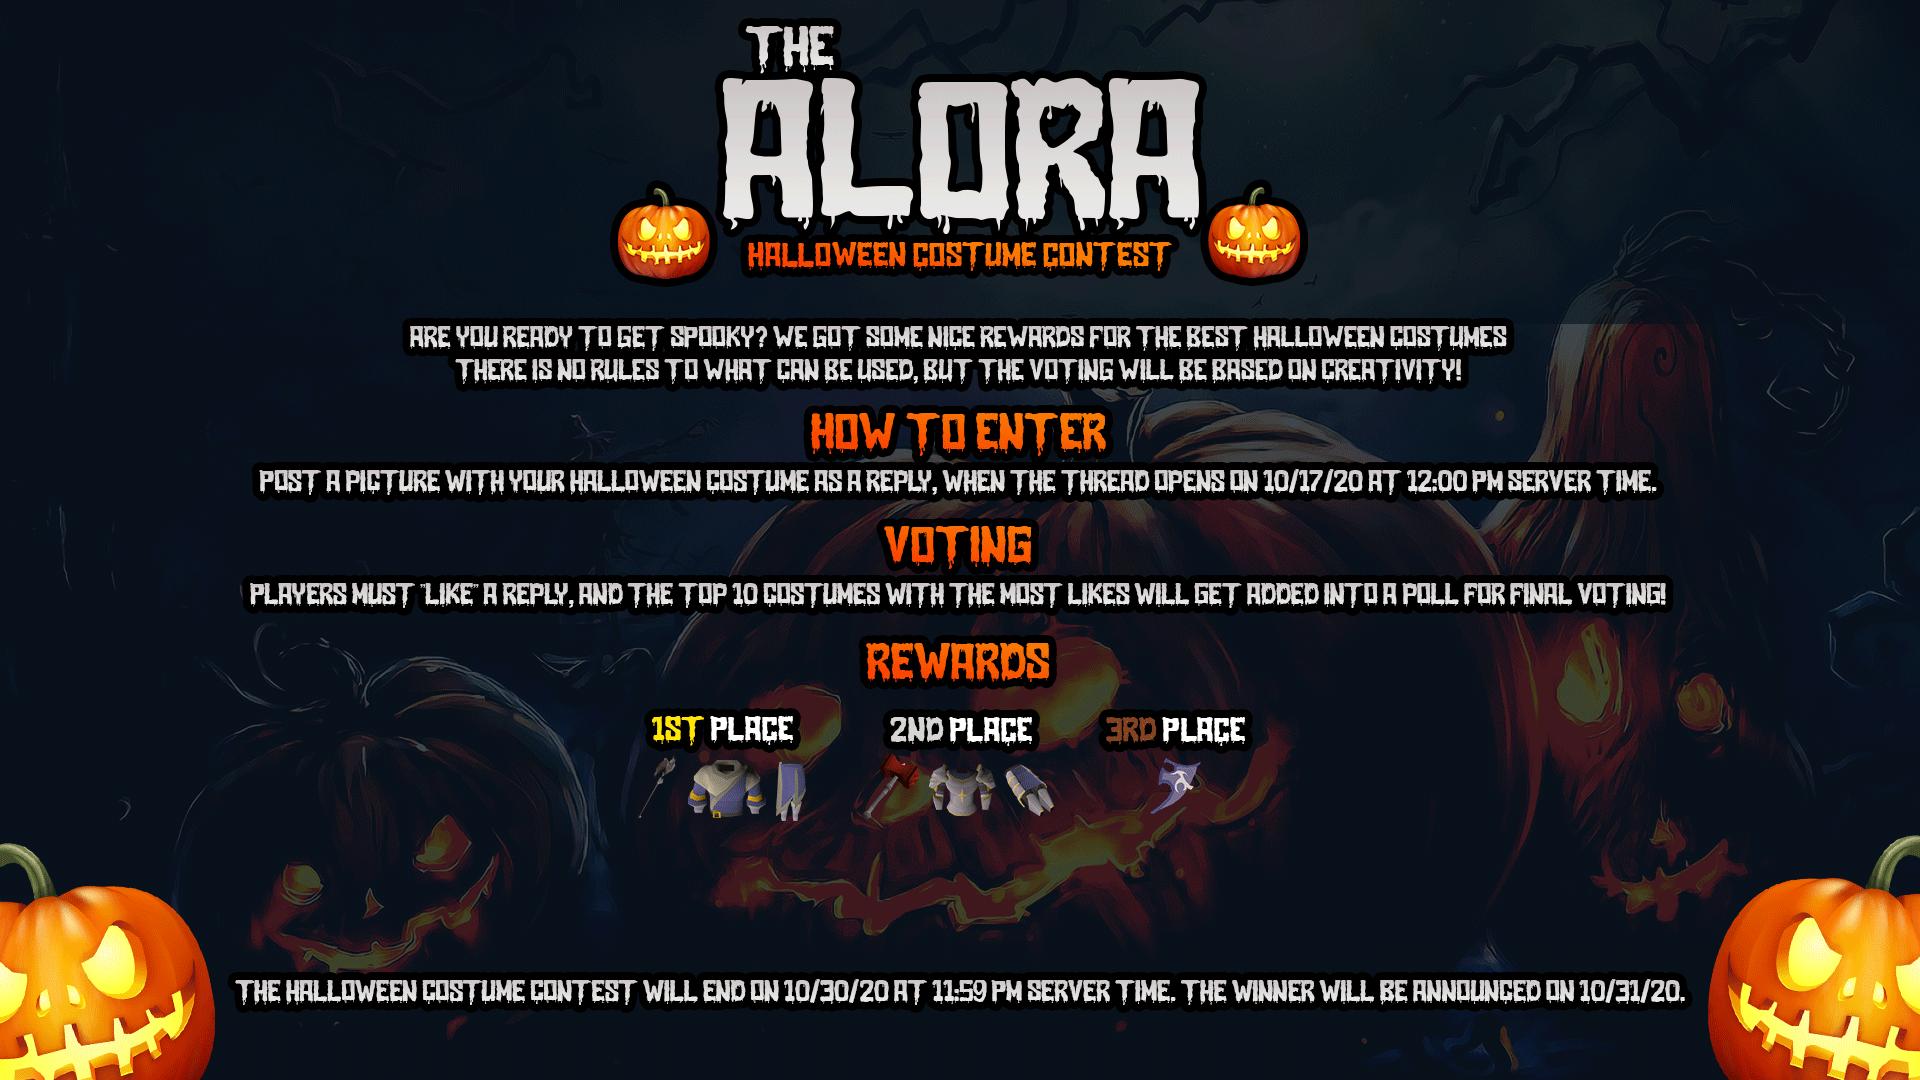 Alora-Halloween-2020.png